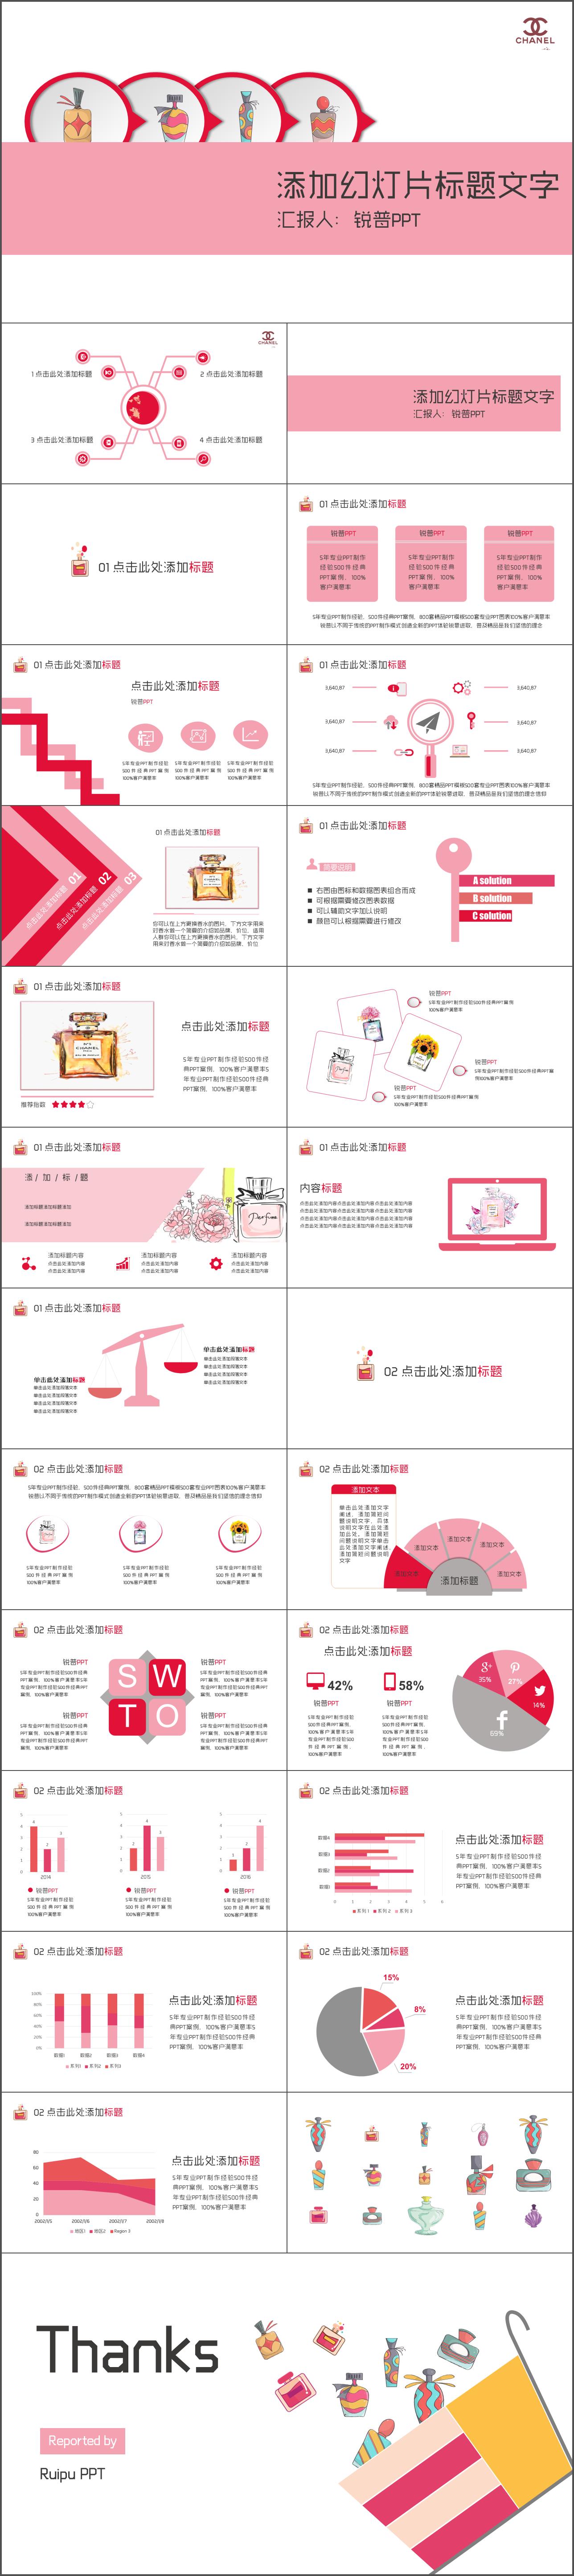 "ppt模板时尚香水(香奈儿no.5)介绍汇报PPT免费下载"""